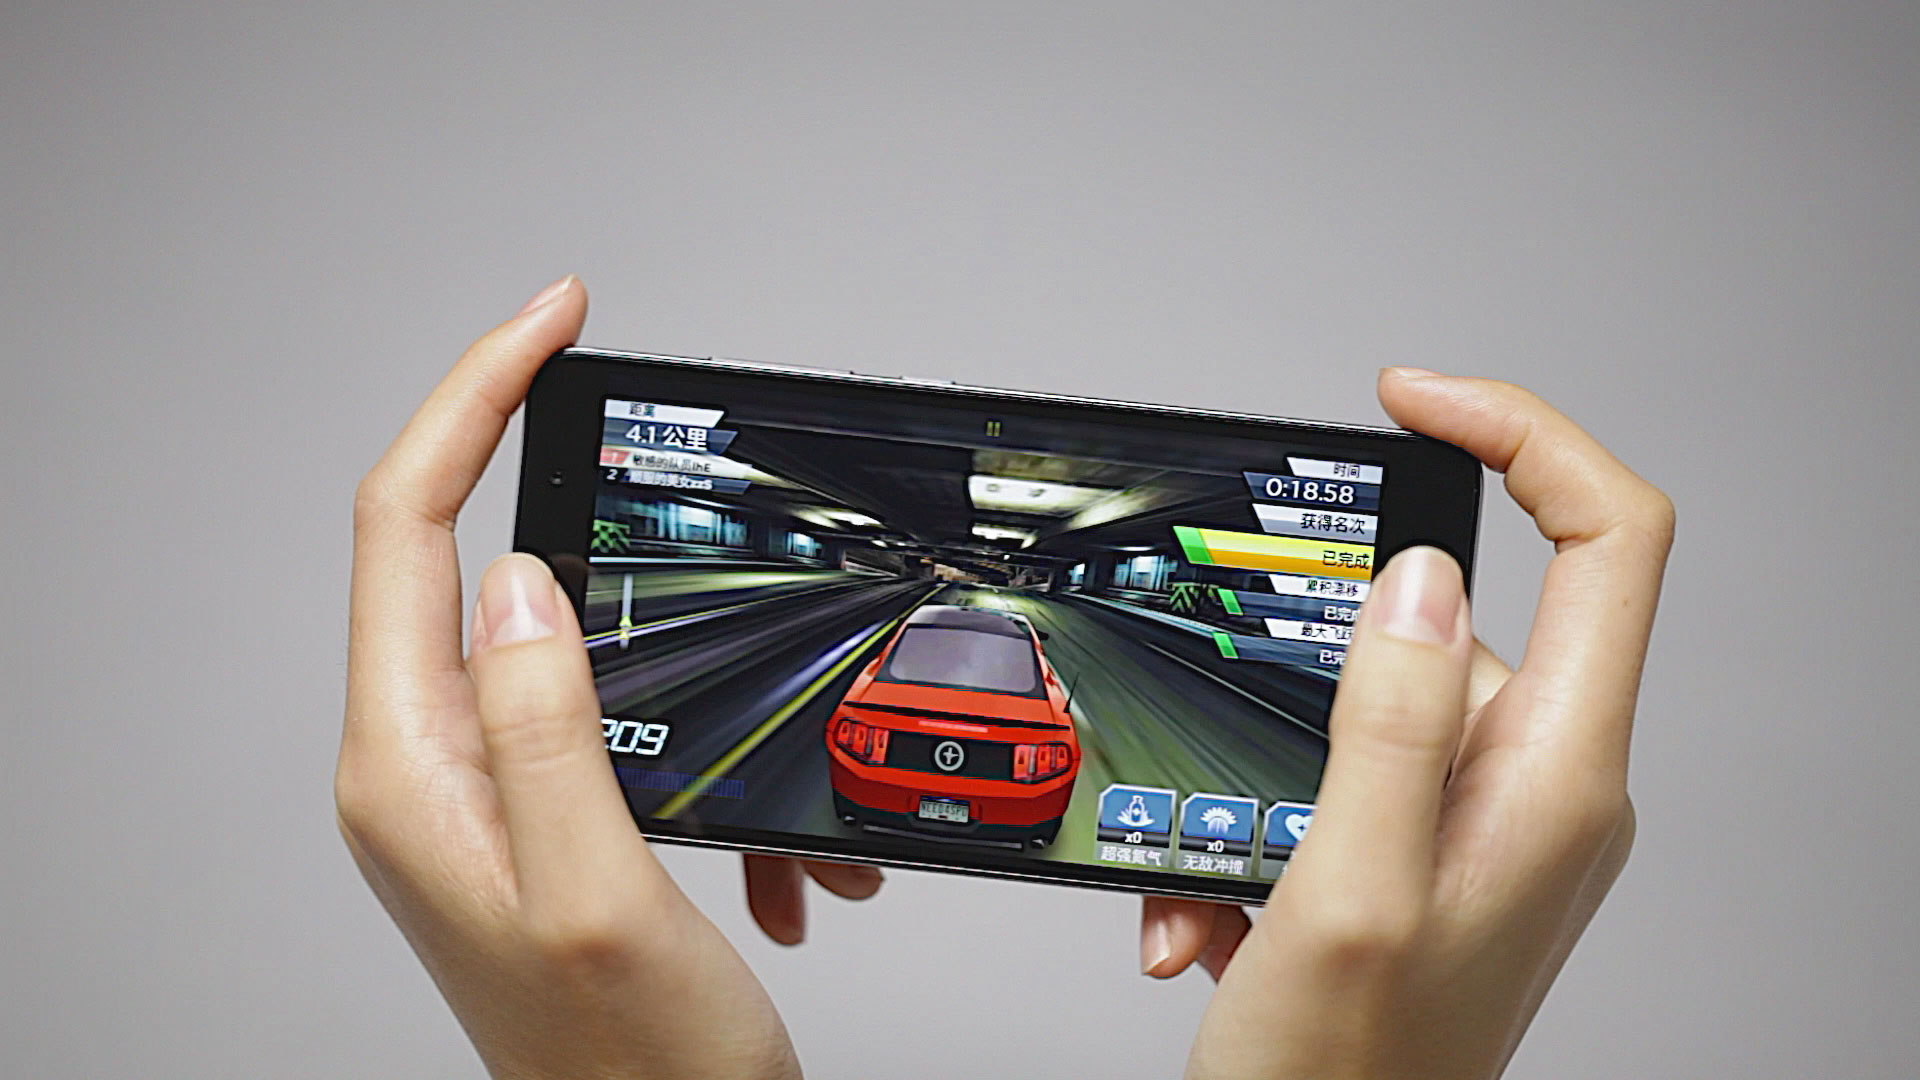 Điểm danh 5 smartphone tầm giá 4 triệu 9